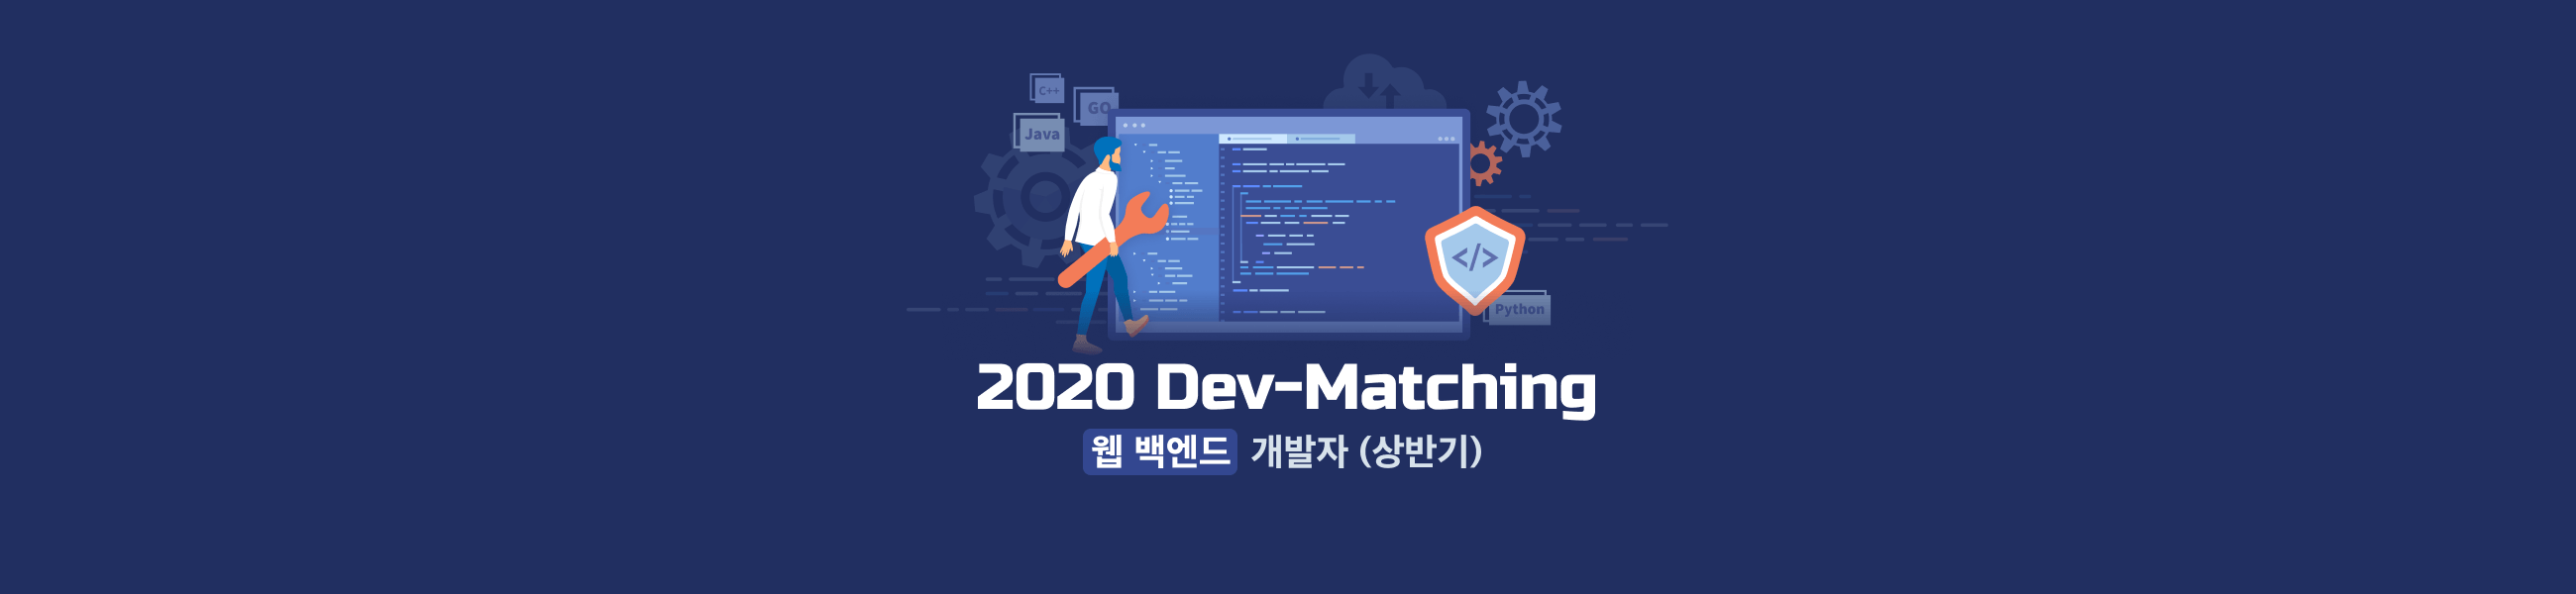 2020 Dev-Matching: 웹 백엔드 개발자(상반기)의 이미지